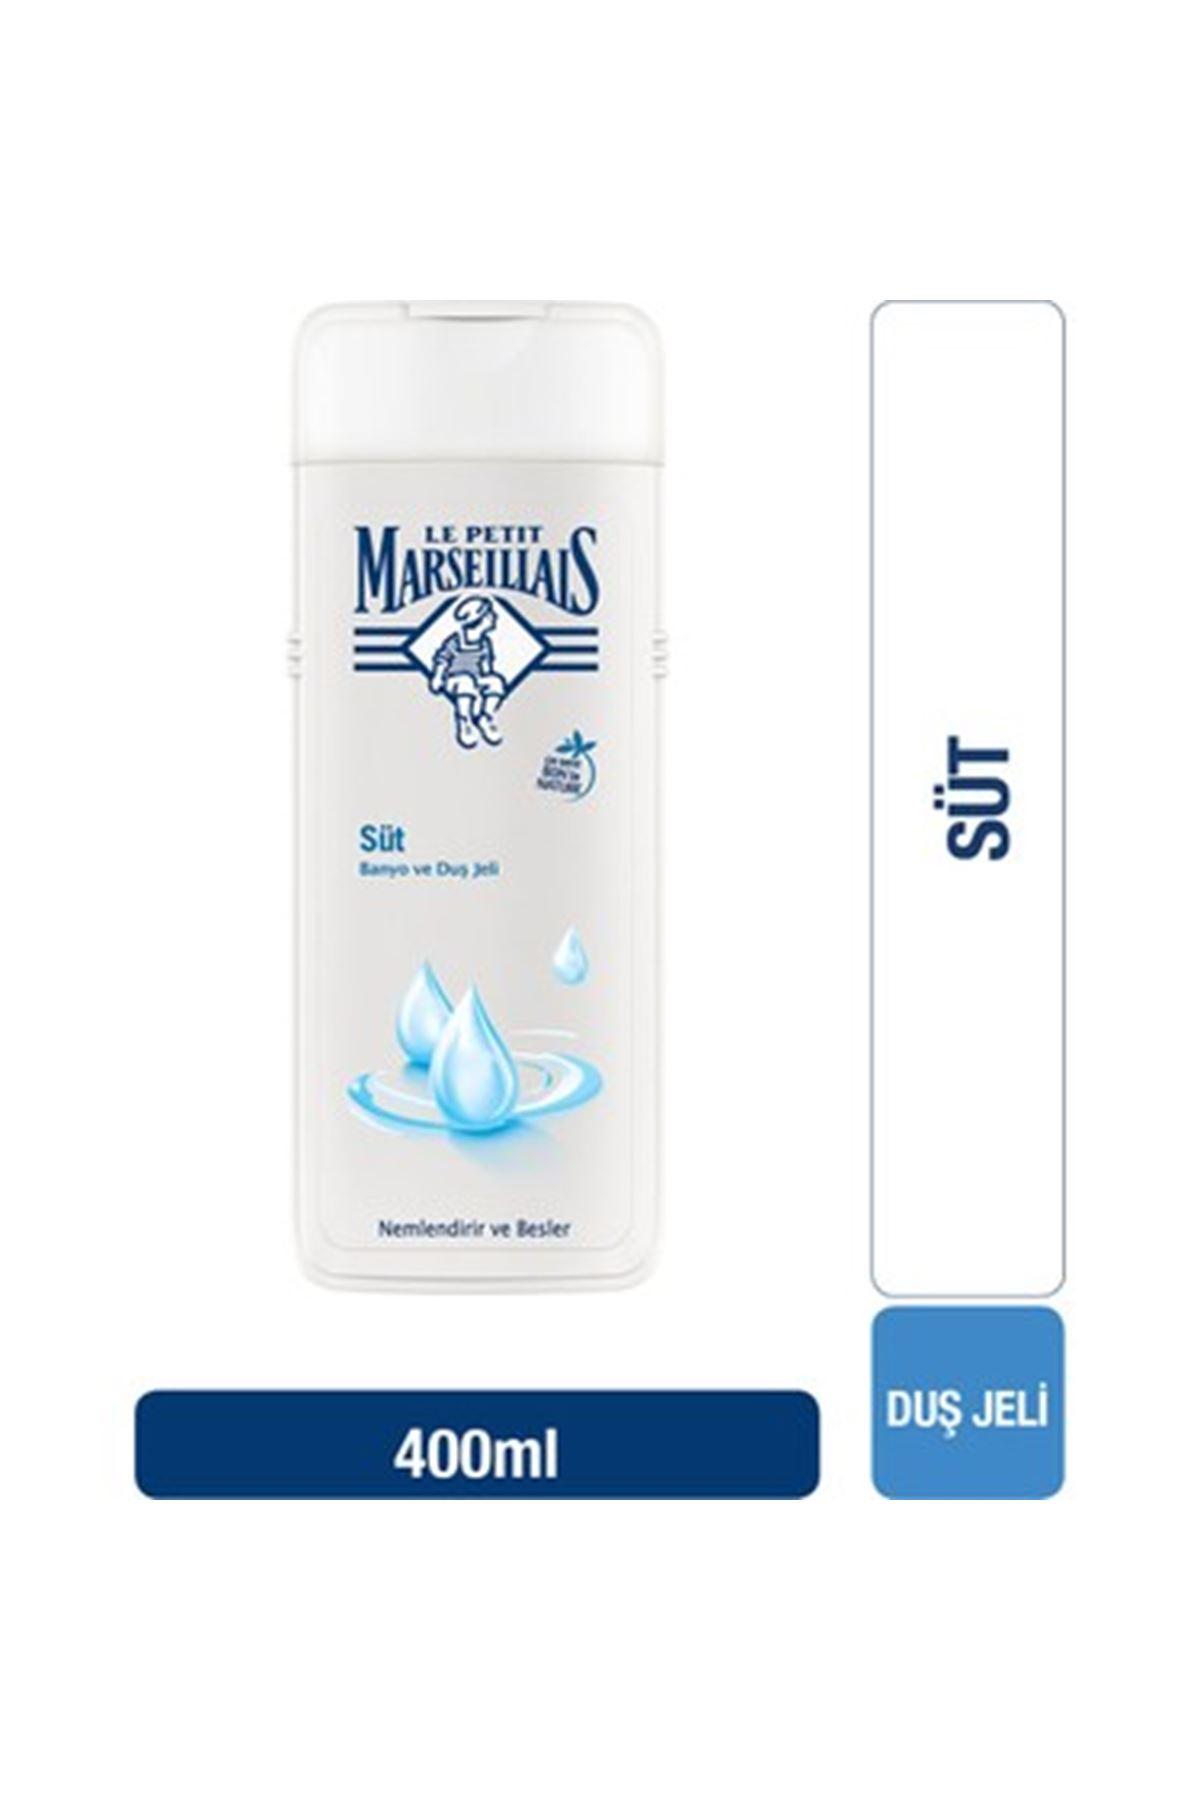 Le Petit Marseillais Süt Duş Jeli 400 ml